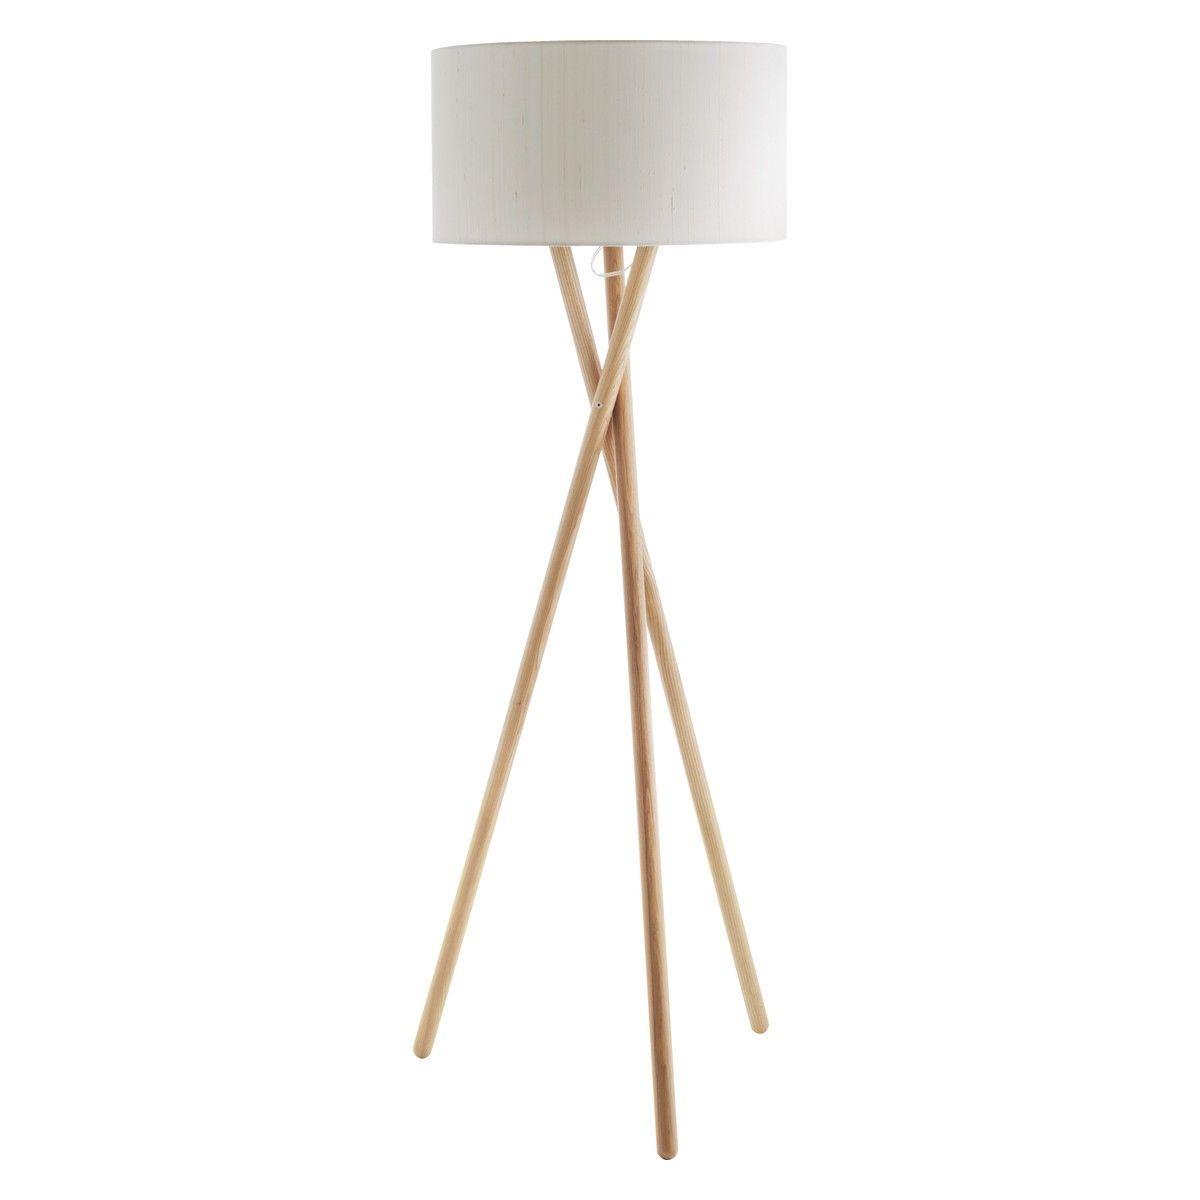 LANSBURY BASE Ash wooden tripod floor lamp | Wooden tripod floor ...